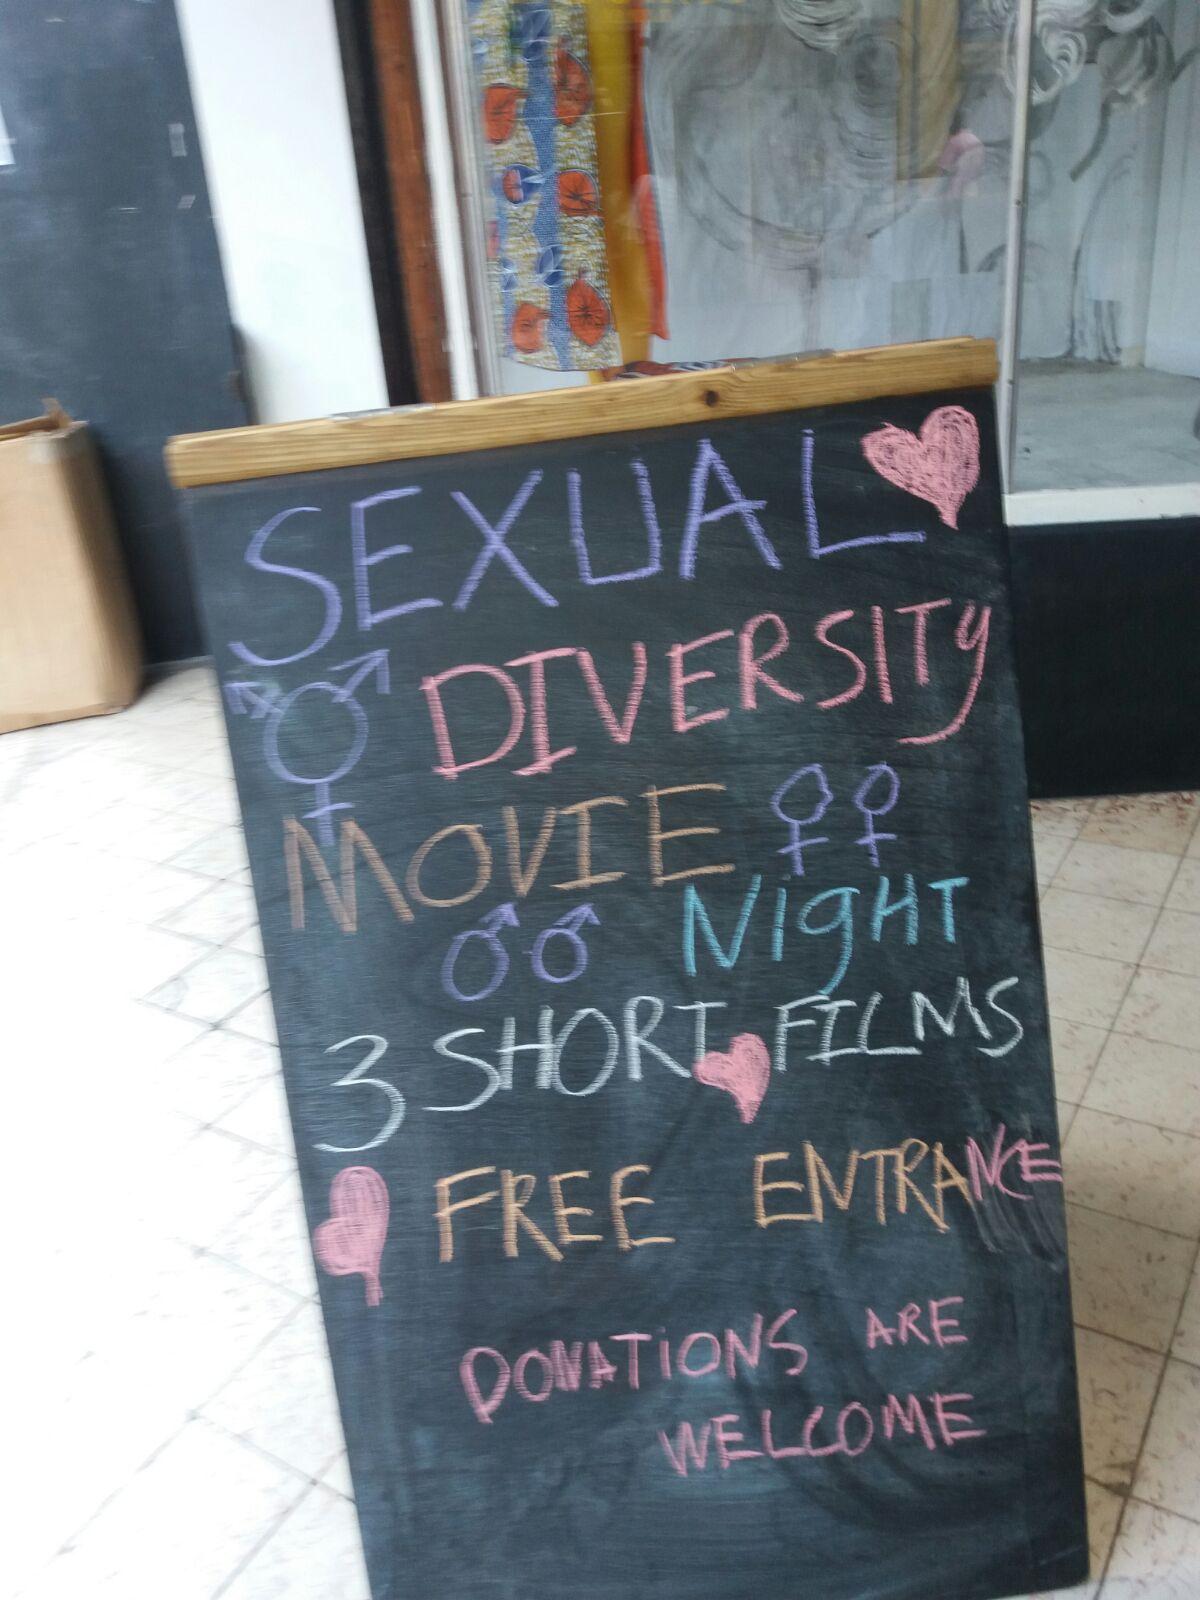 Sexual Diversity movie night 4.jpeg